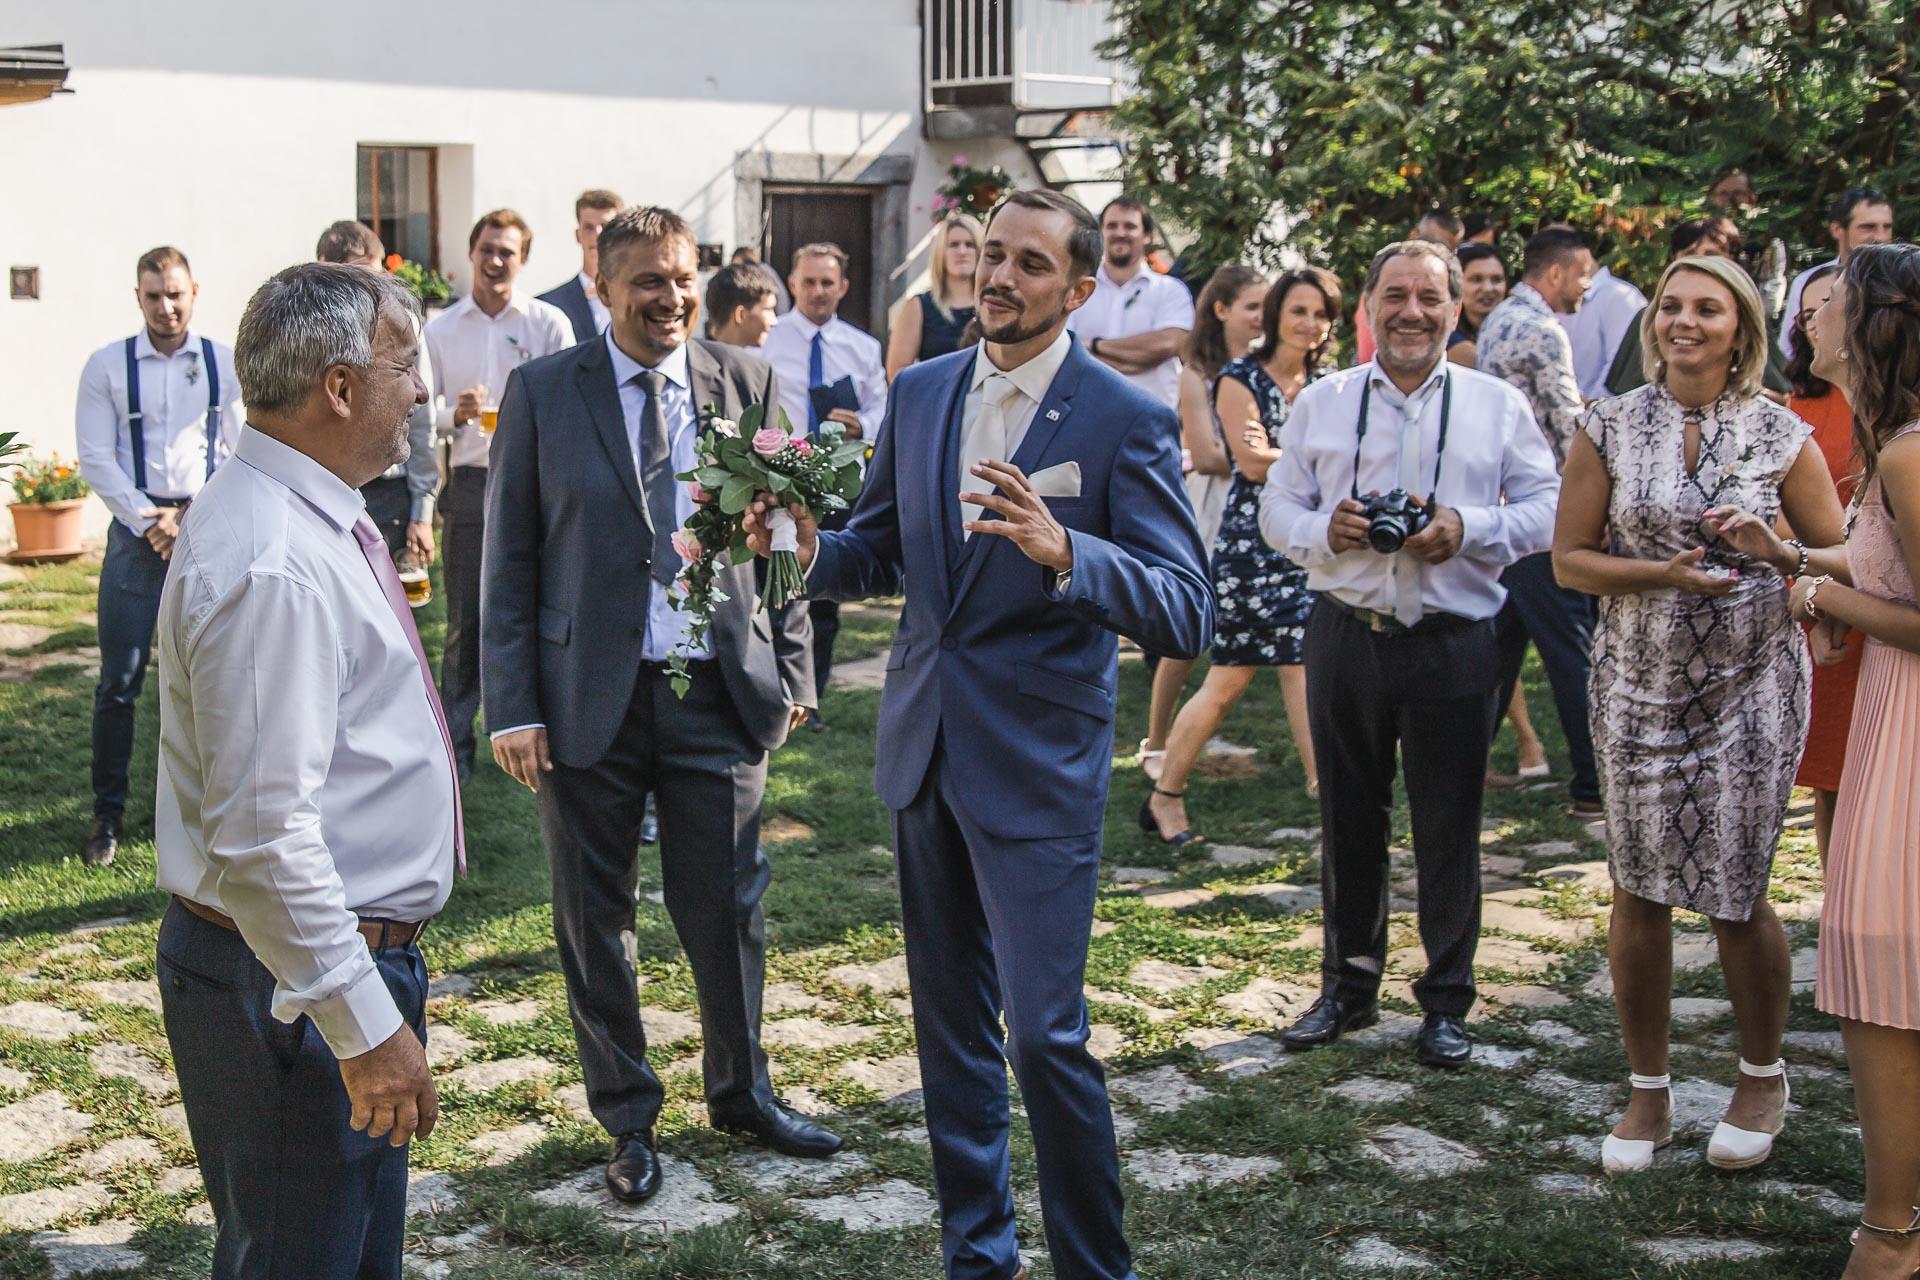 svatební-fotograf-wedding-svatebni-video-orlík-vltava-kostel-statek-stodola-boho-svatba-Beautyfoto-106